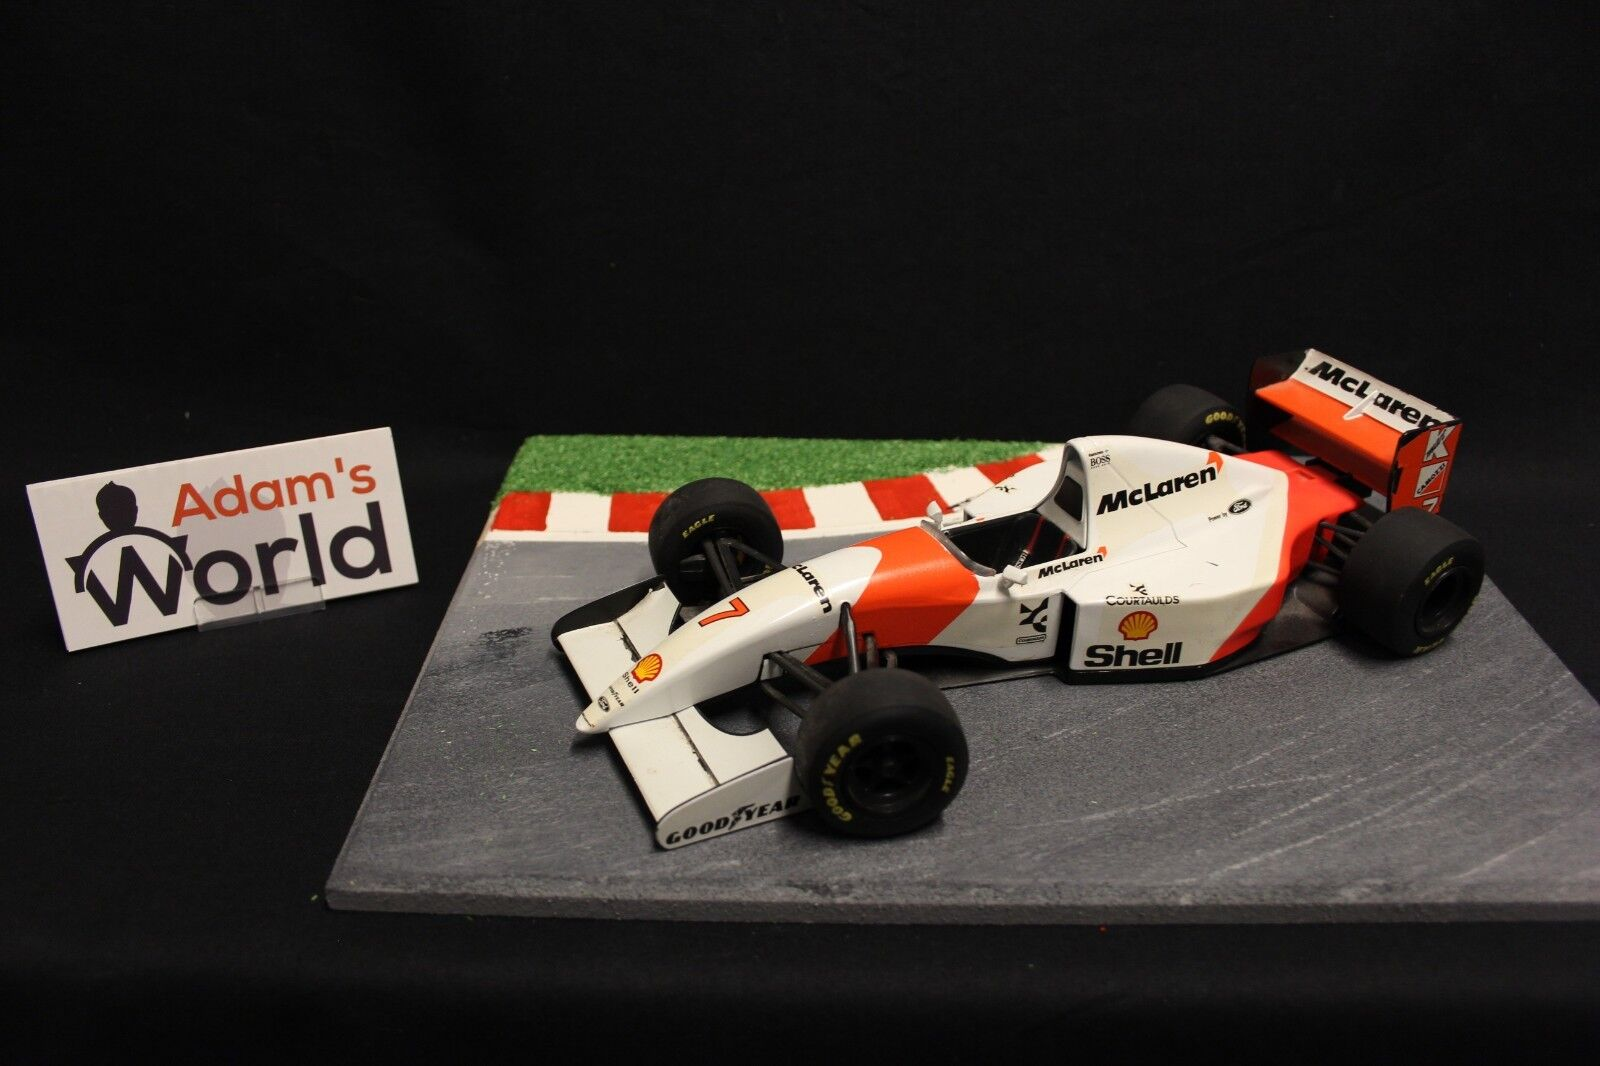 disponibile Minichamps McLaren Ford MP4-8 1993 1 18  7 7 7 Mika Hakkinen (FIN) (F1NB)  negozio outlet